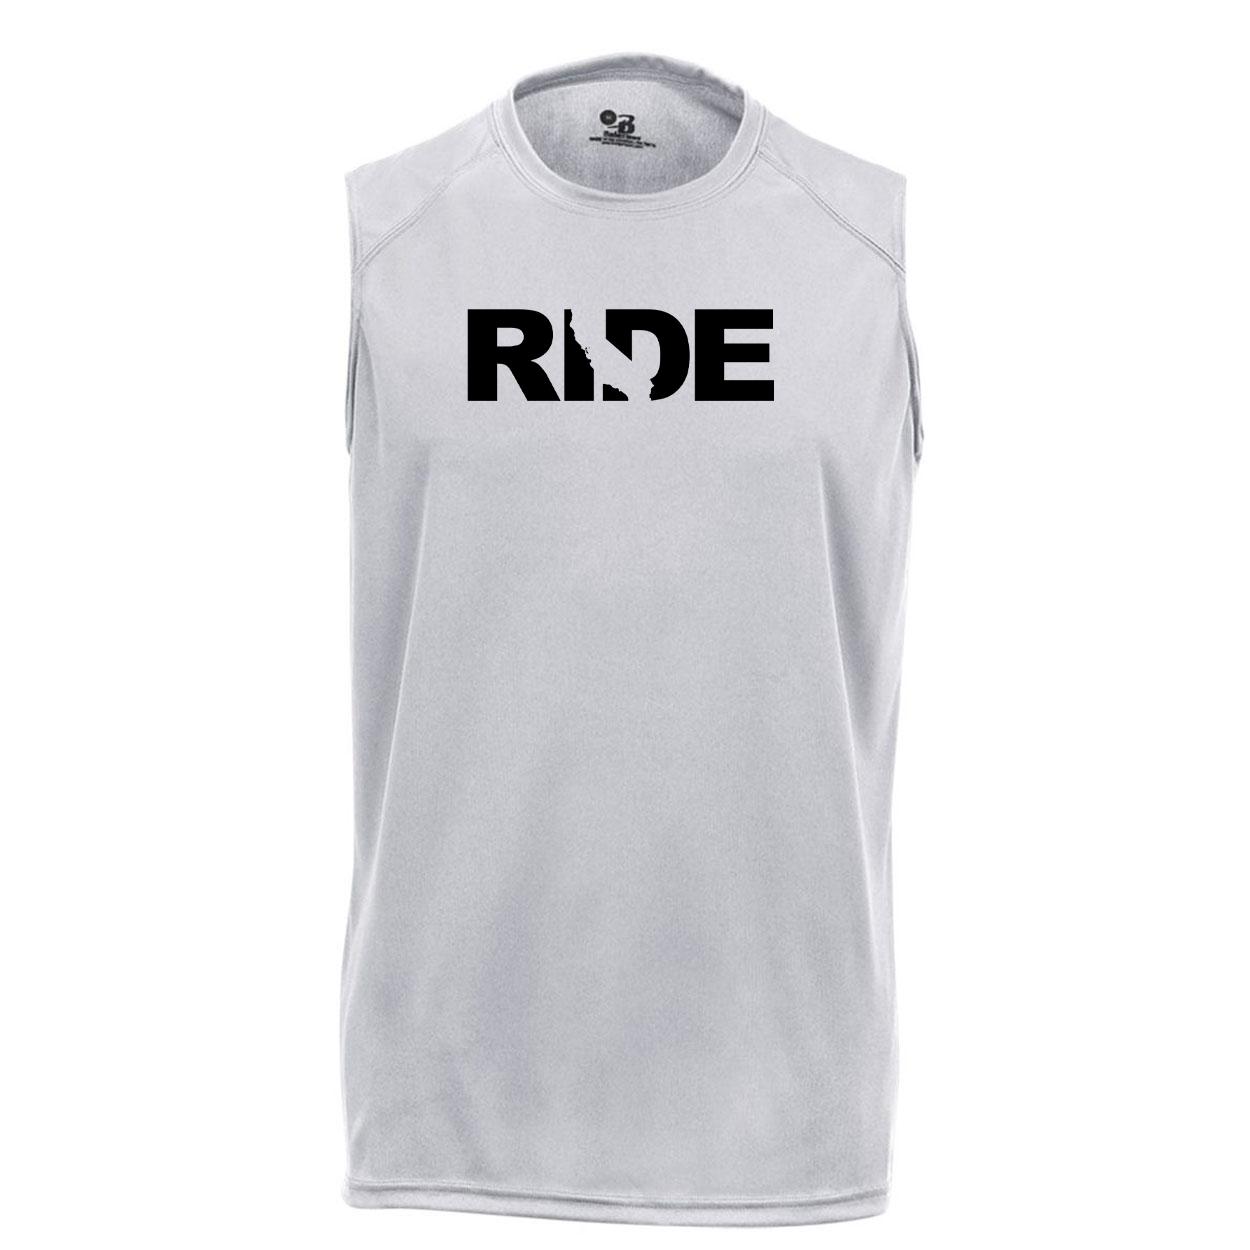 Ride California Classic Unisex Performance Sleeveless T-Shirt Silver Gray (Black Logo)